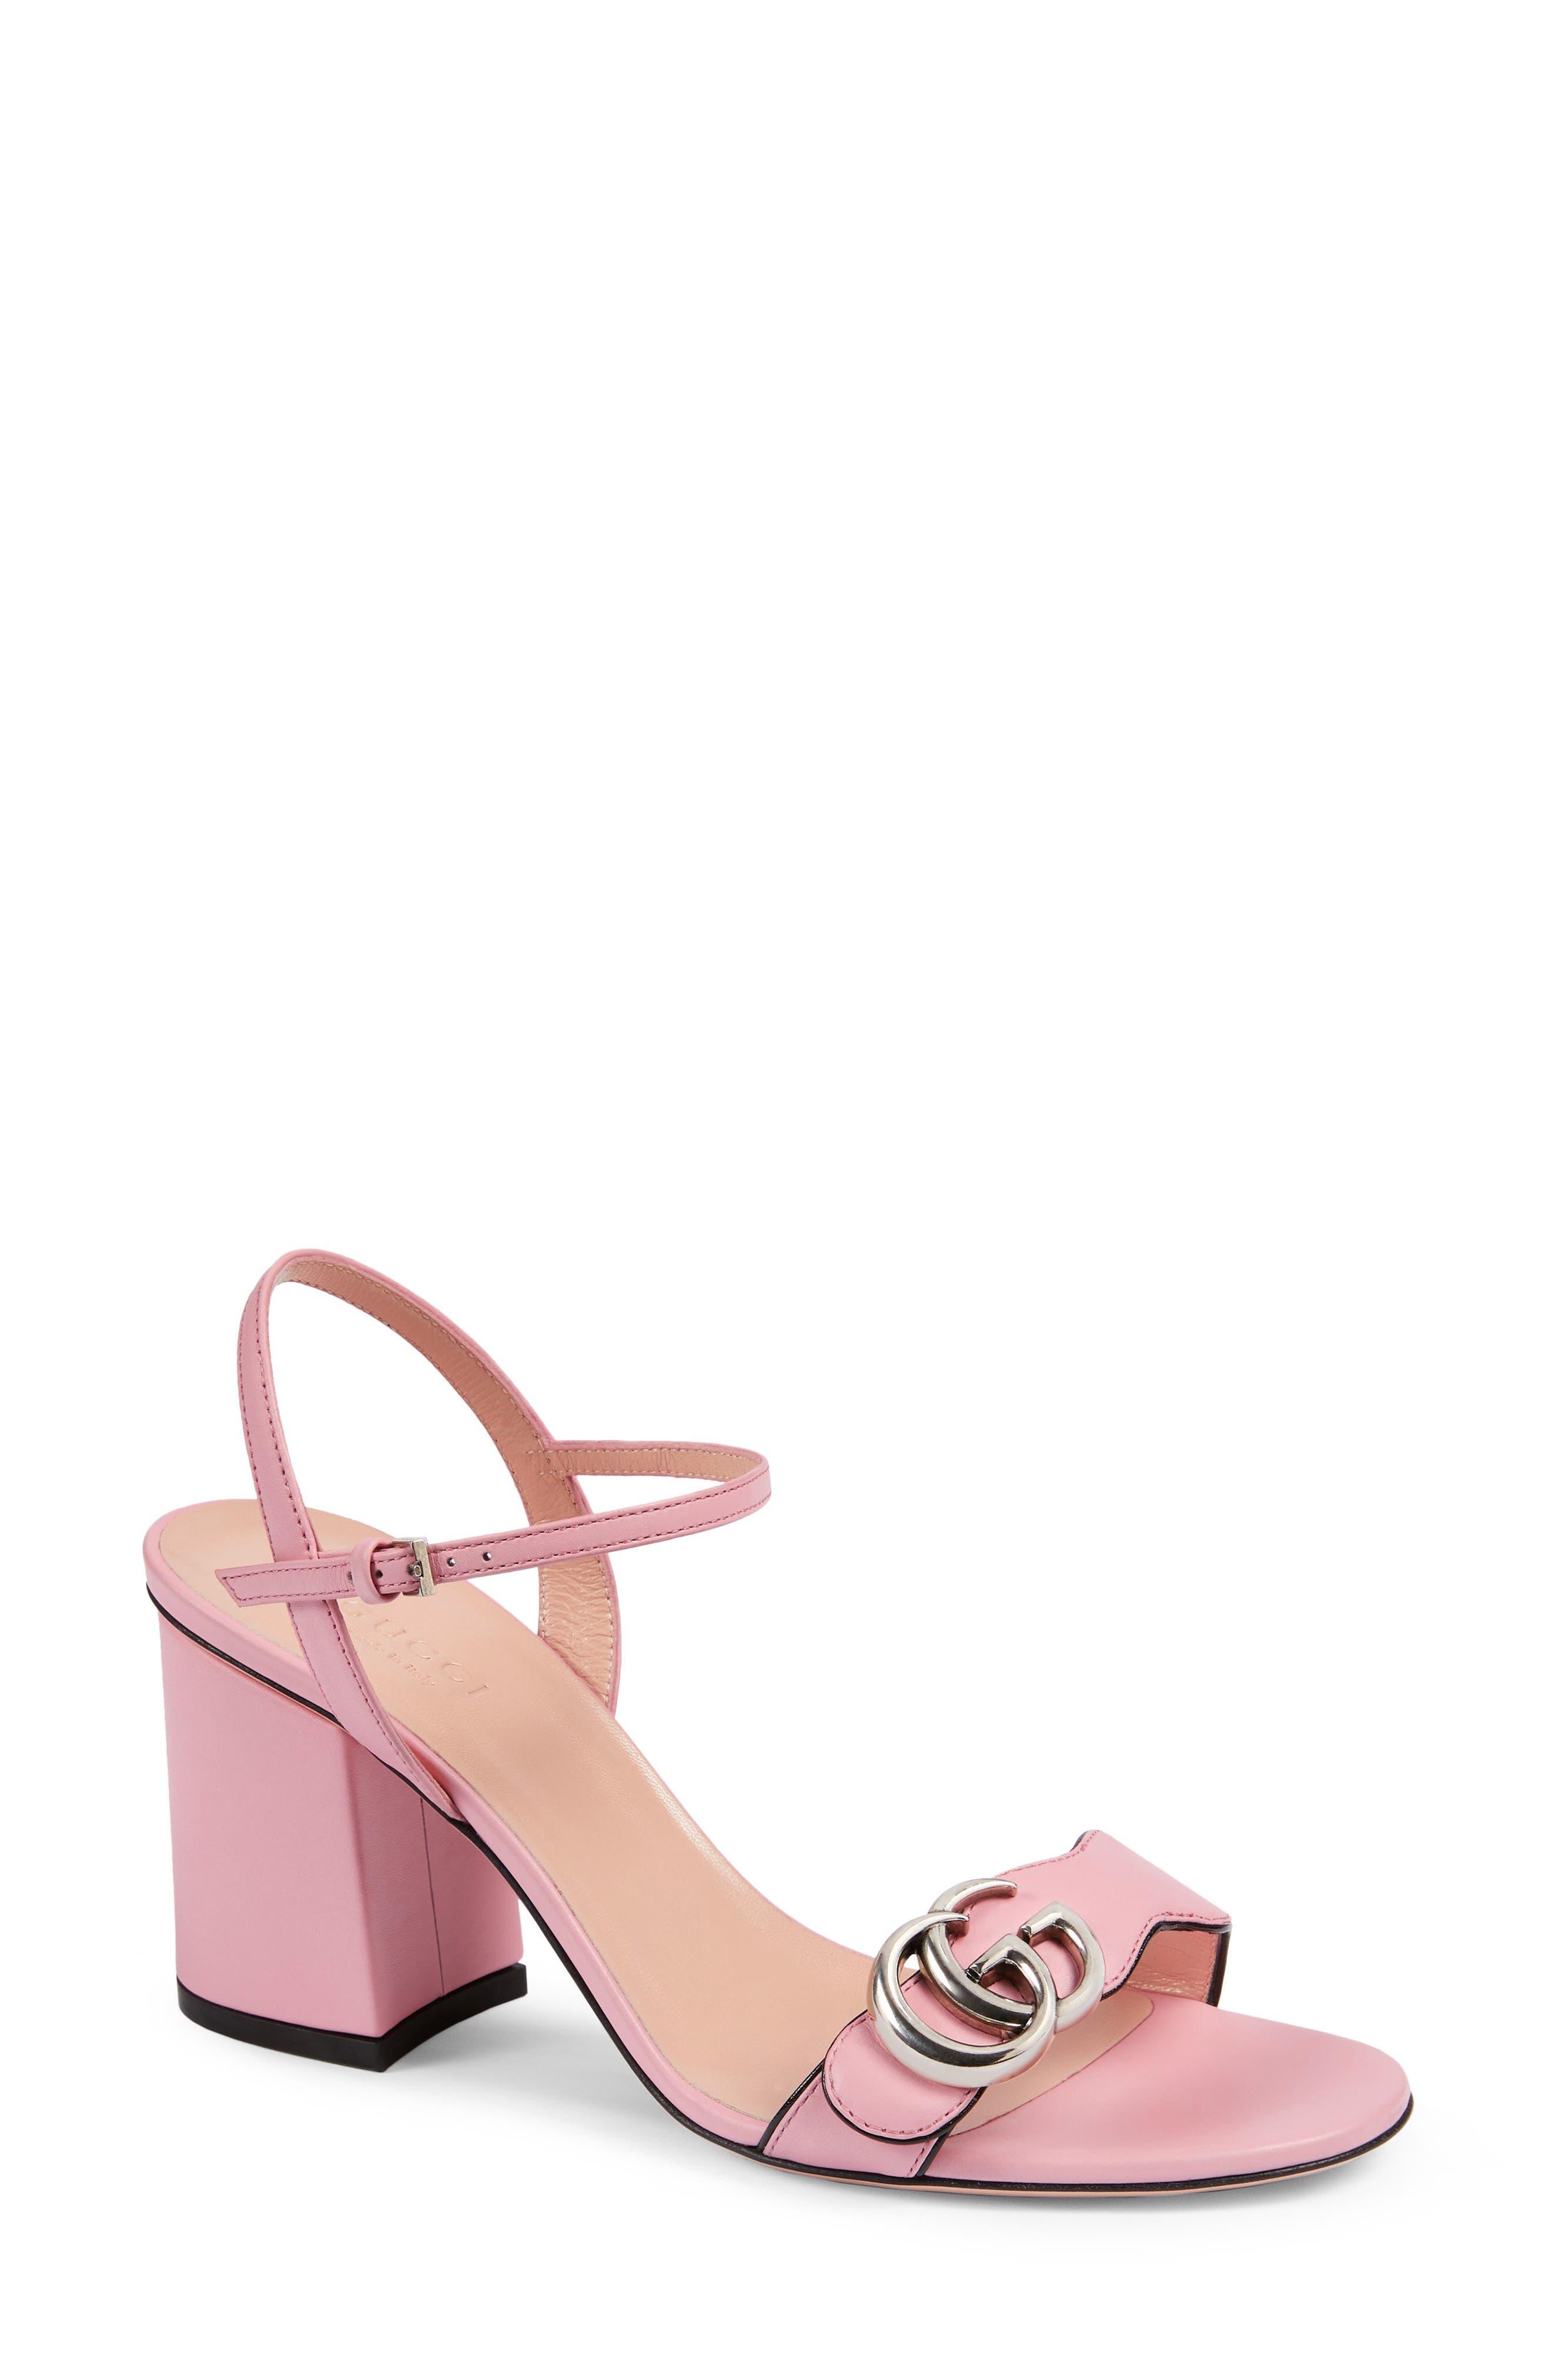 gucci pink shoes heels